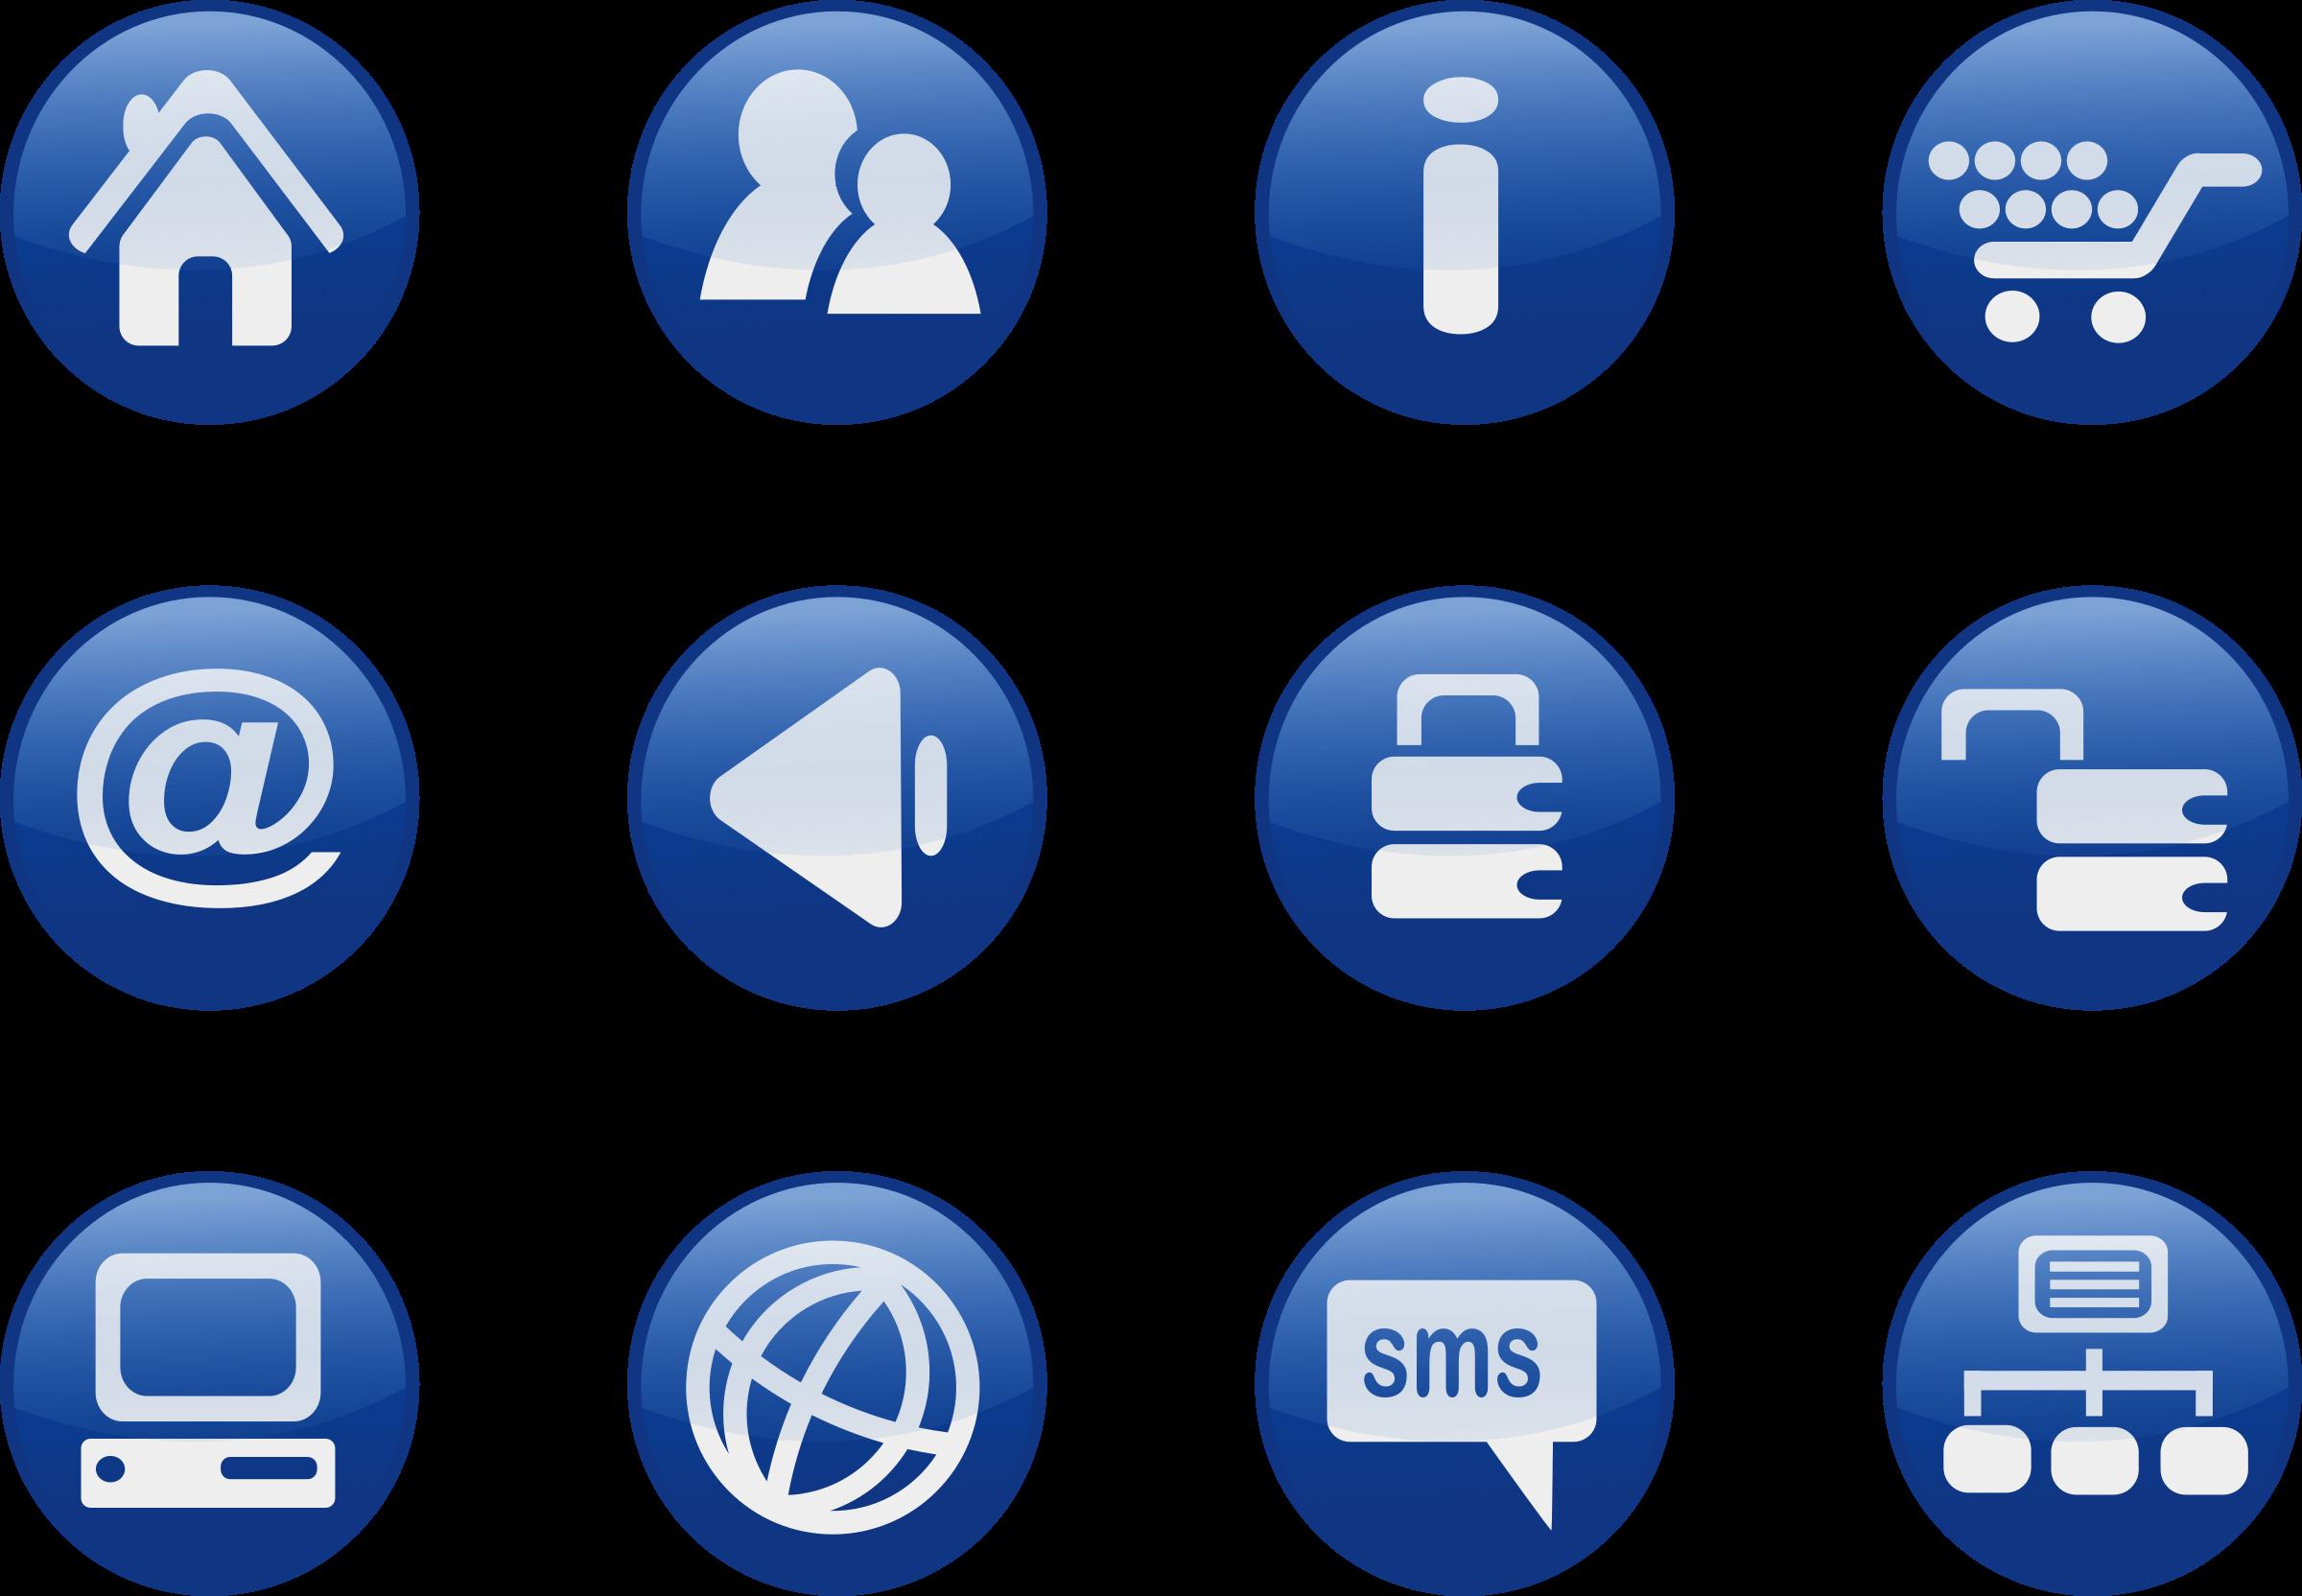 Web icons big image. Website clipart website button